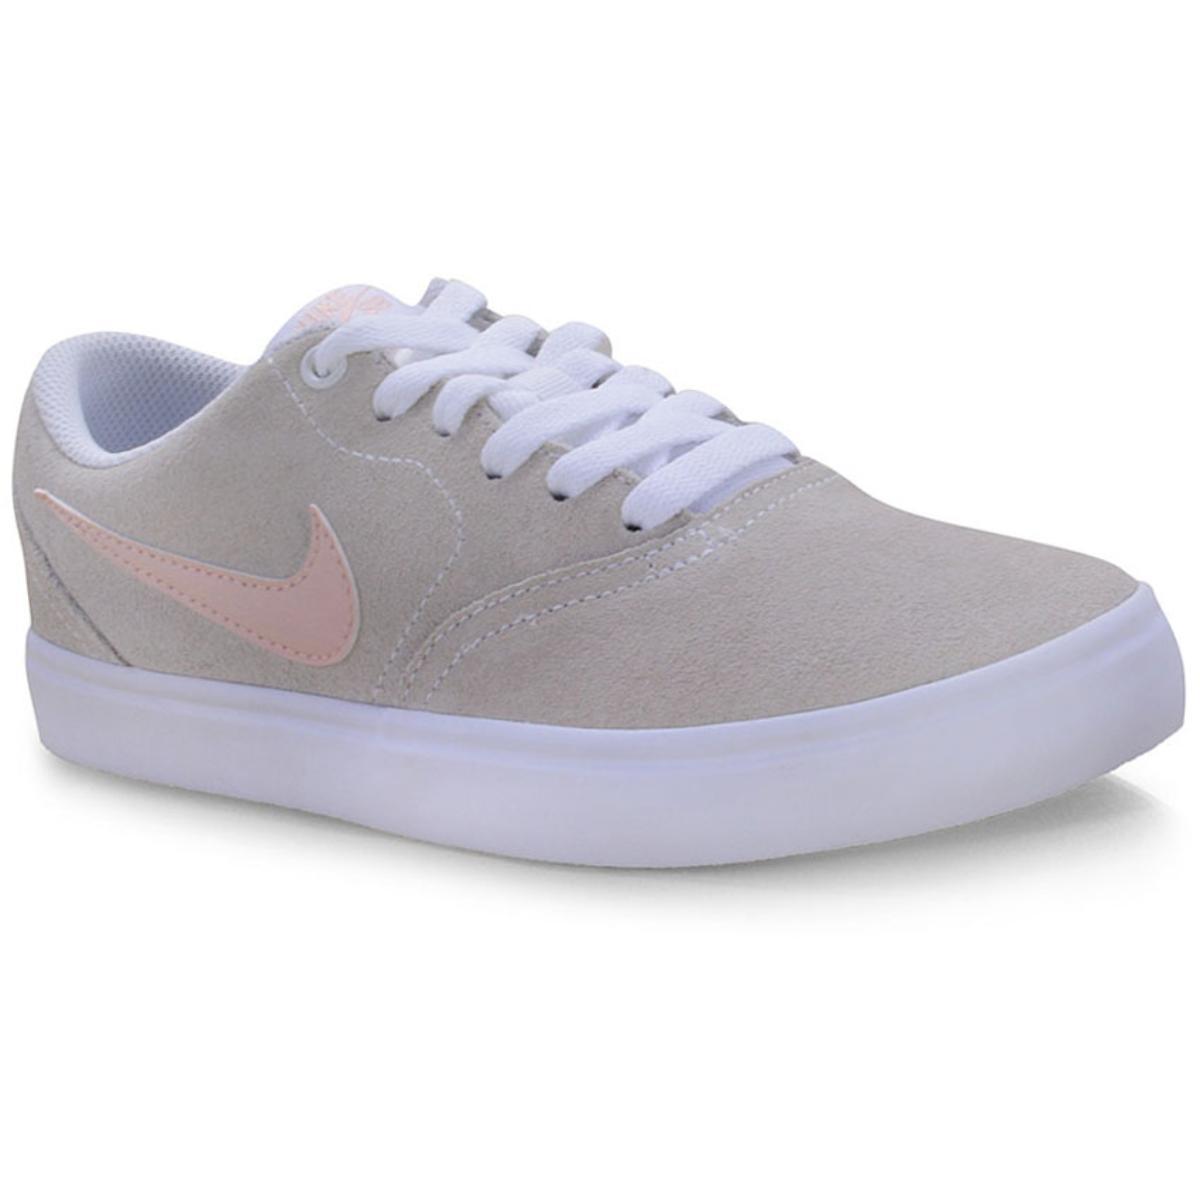 Tênis Feminino Nike Bq3240-100 Wmns sb Check Solar Bege/rose/branco